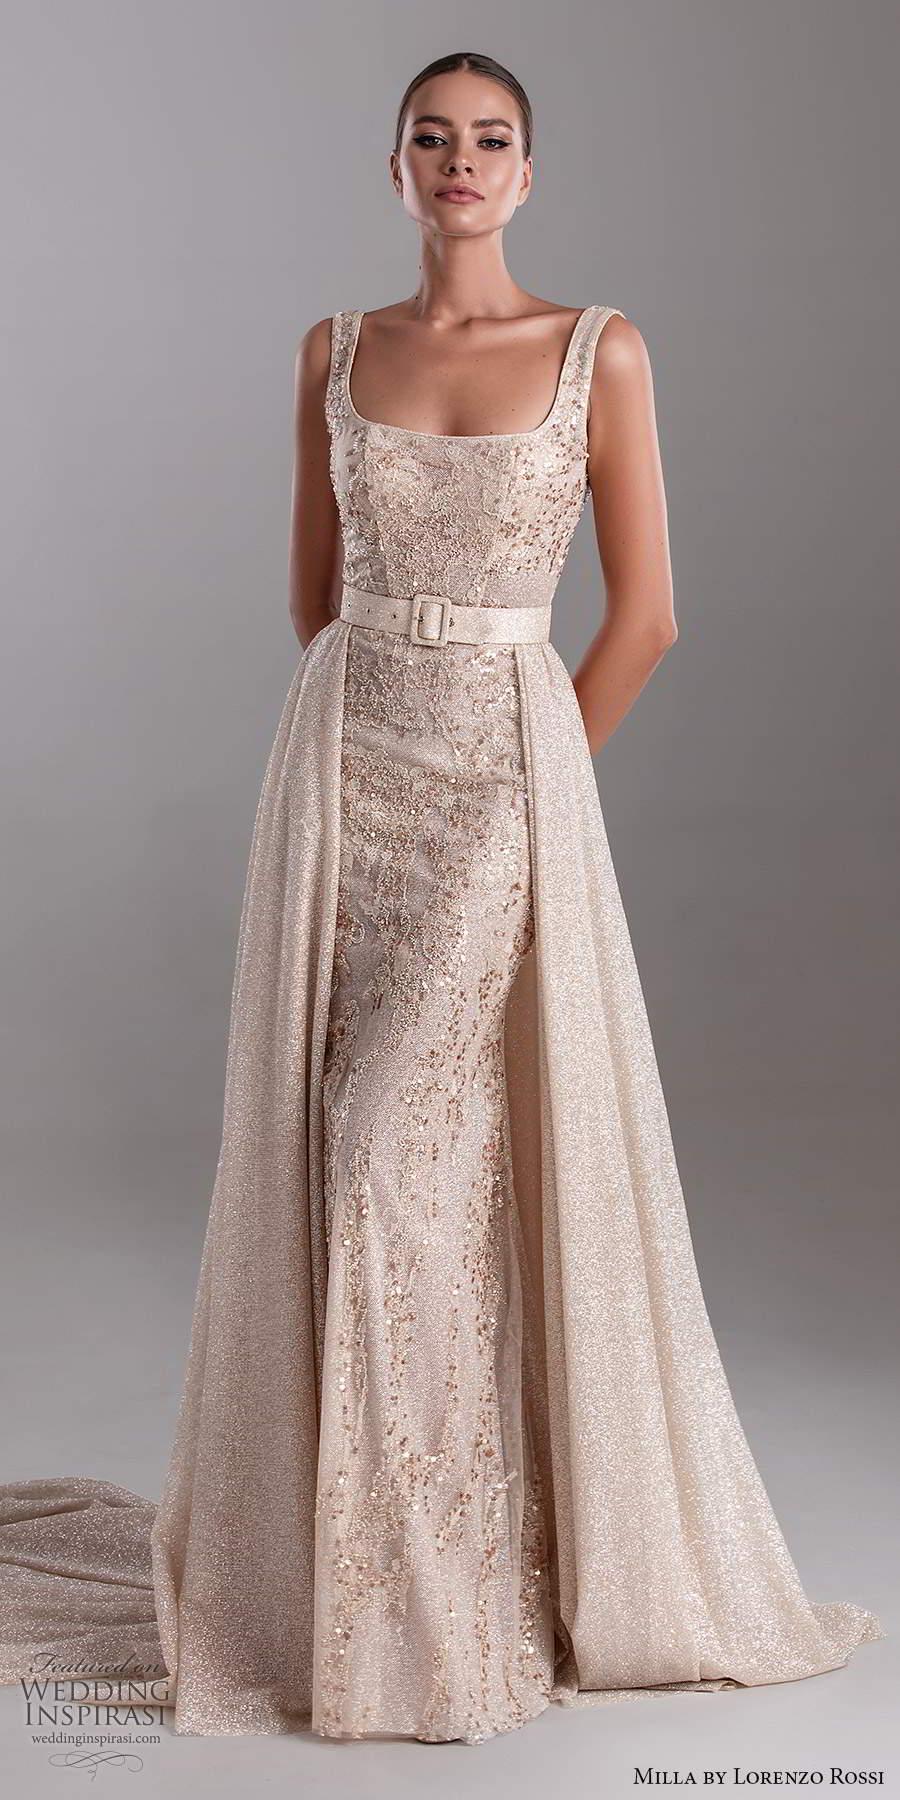 milla by lorenzo rossi 2020 rtw sleeveless thick straps square neckline fully embellished sheath dress a line overskirt (28) mv